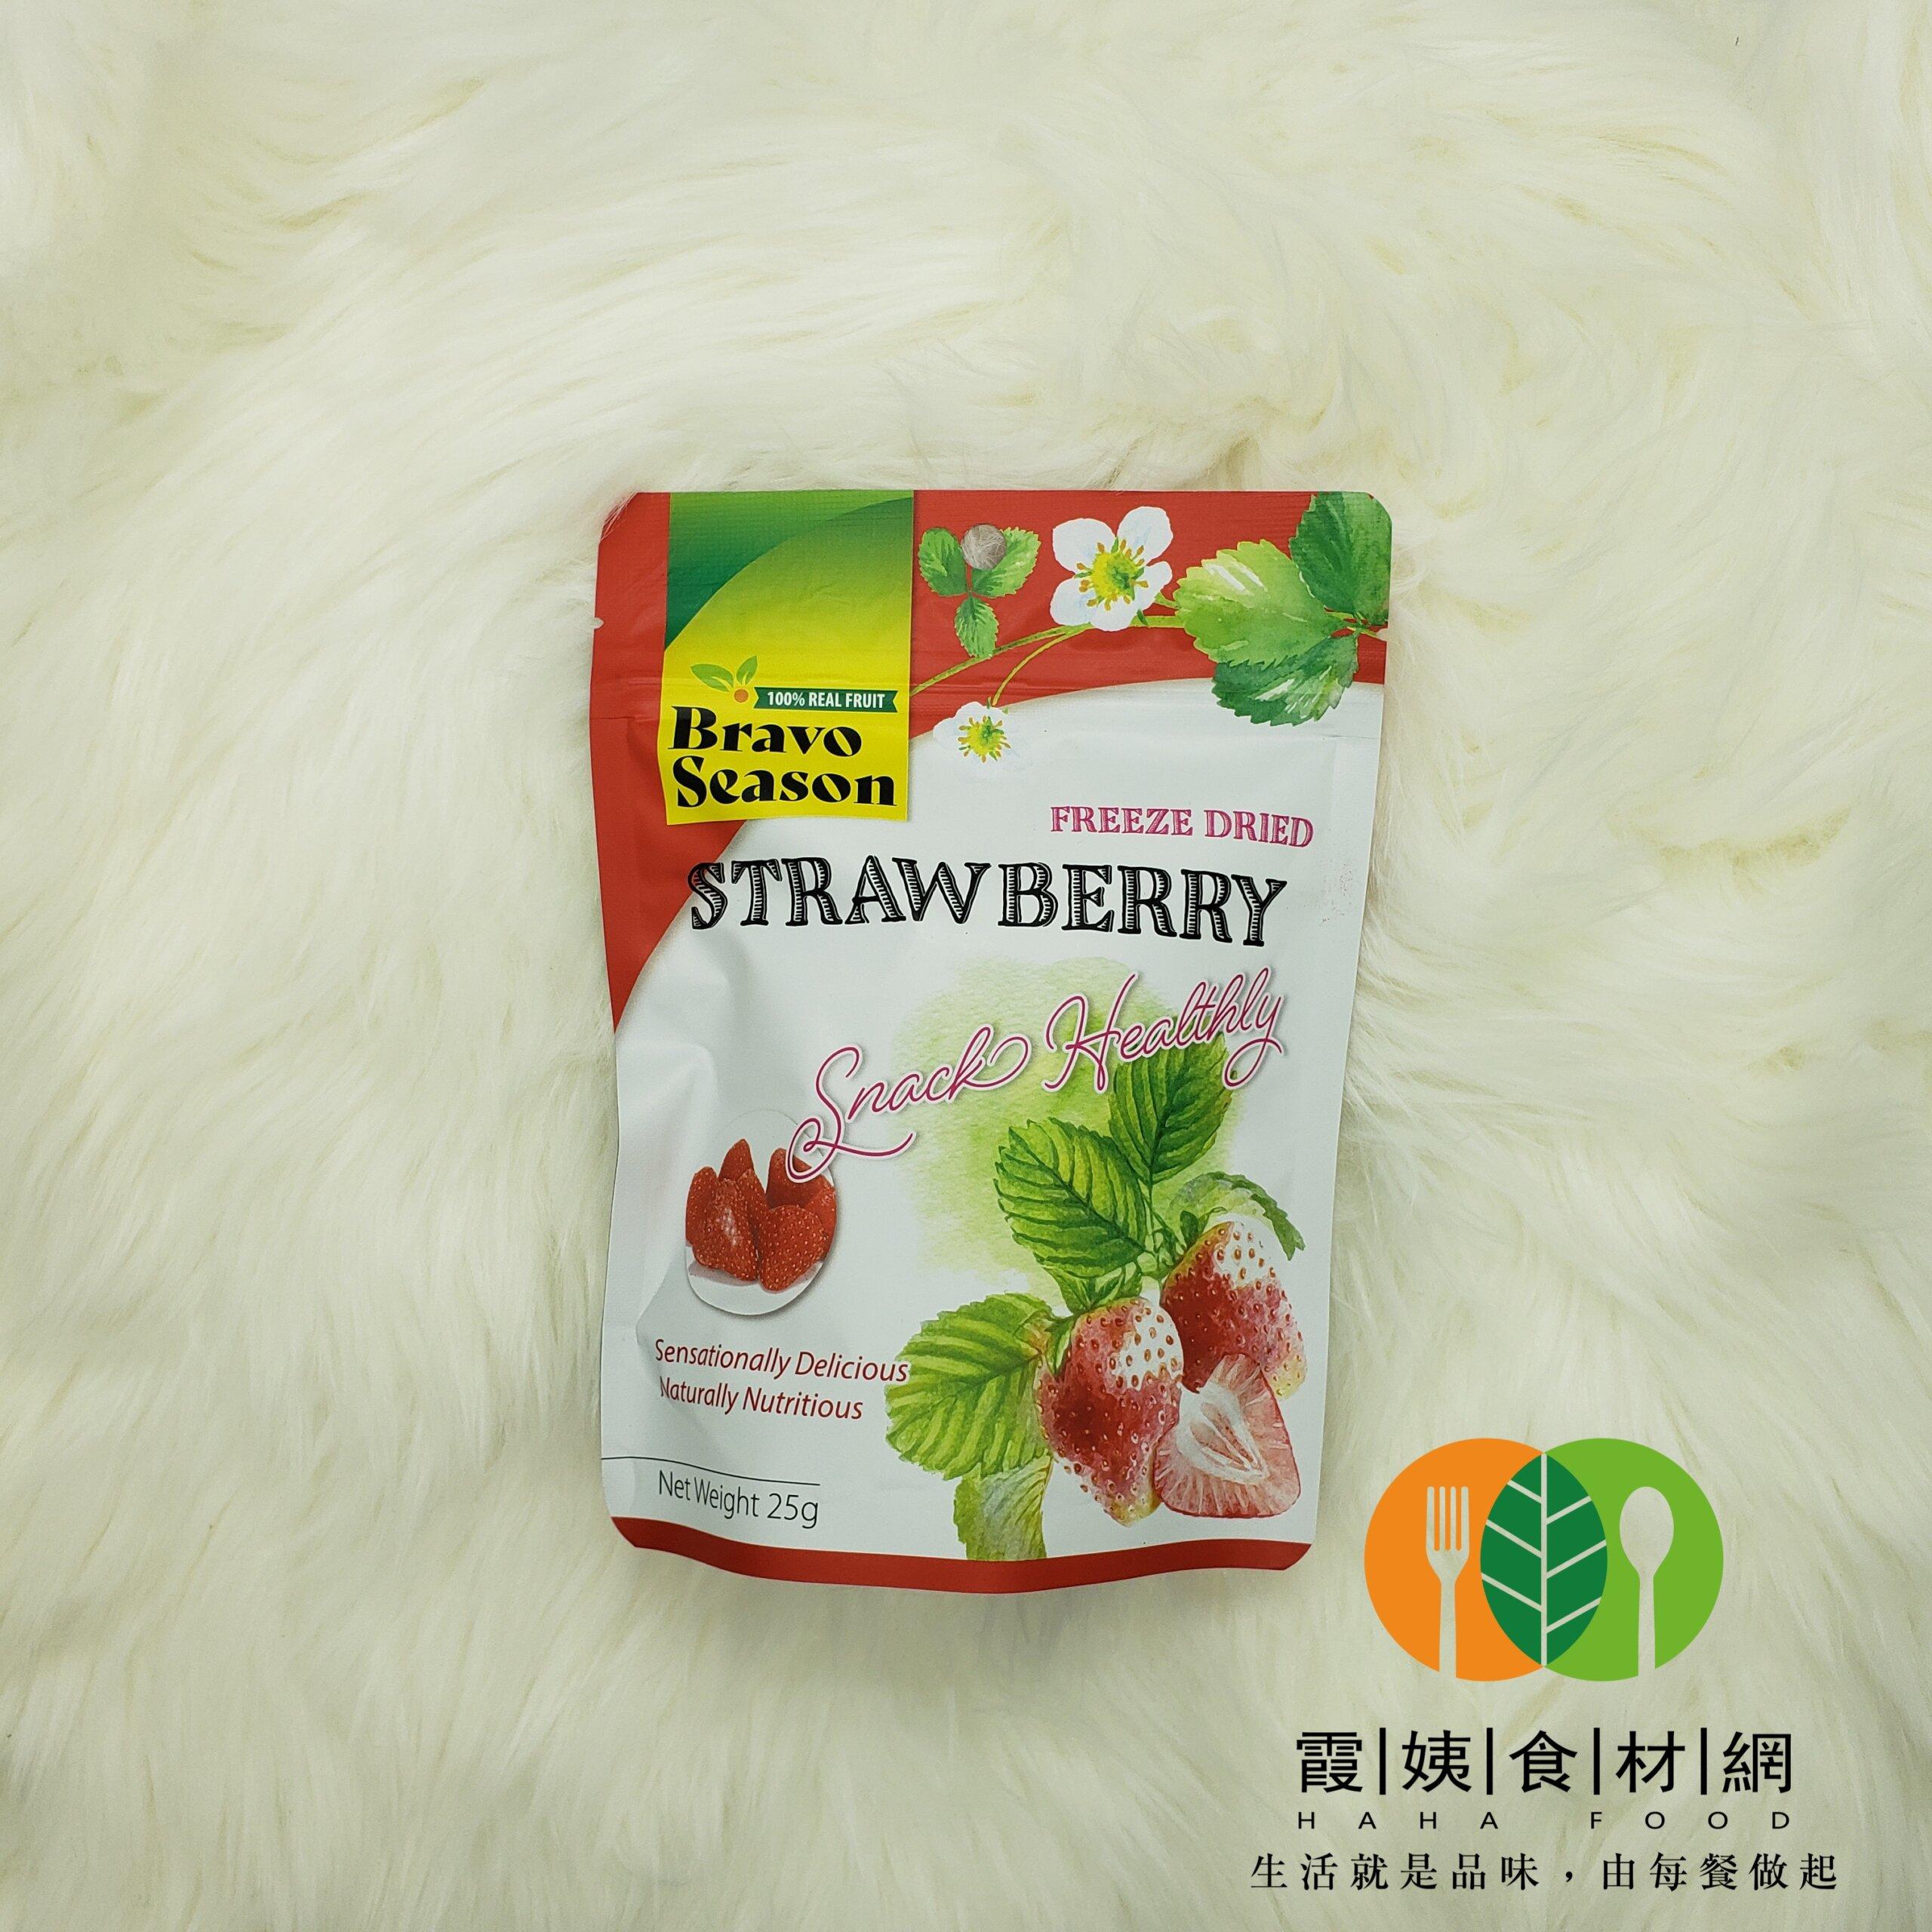 A256 bravo season 草莓凍乾